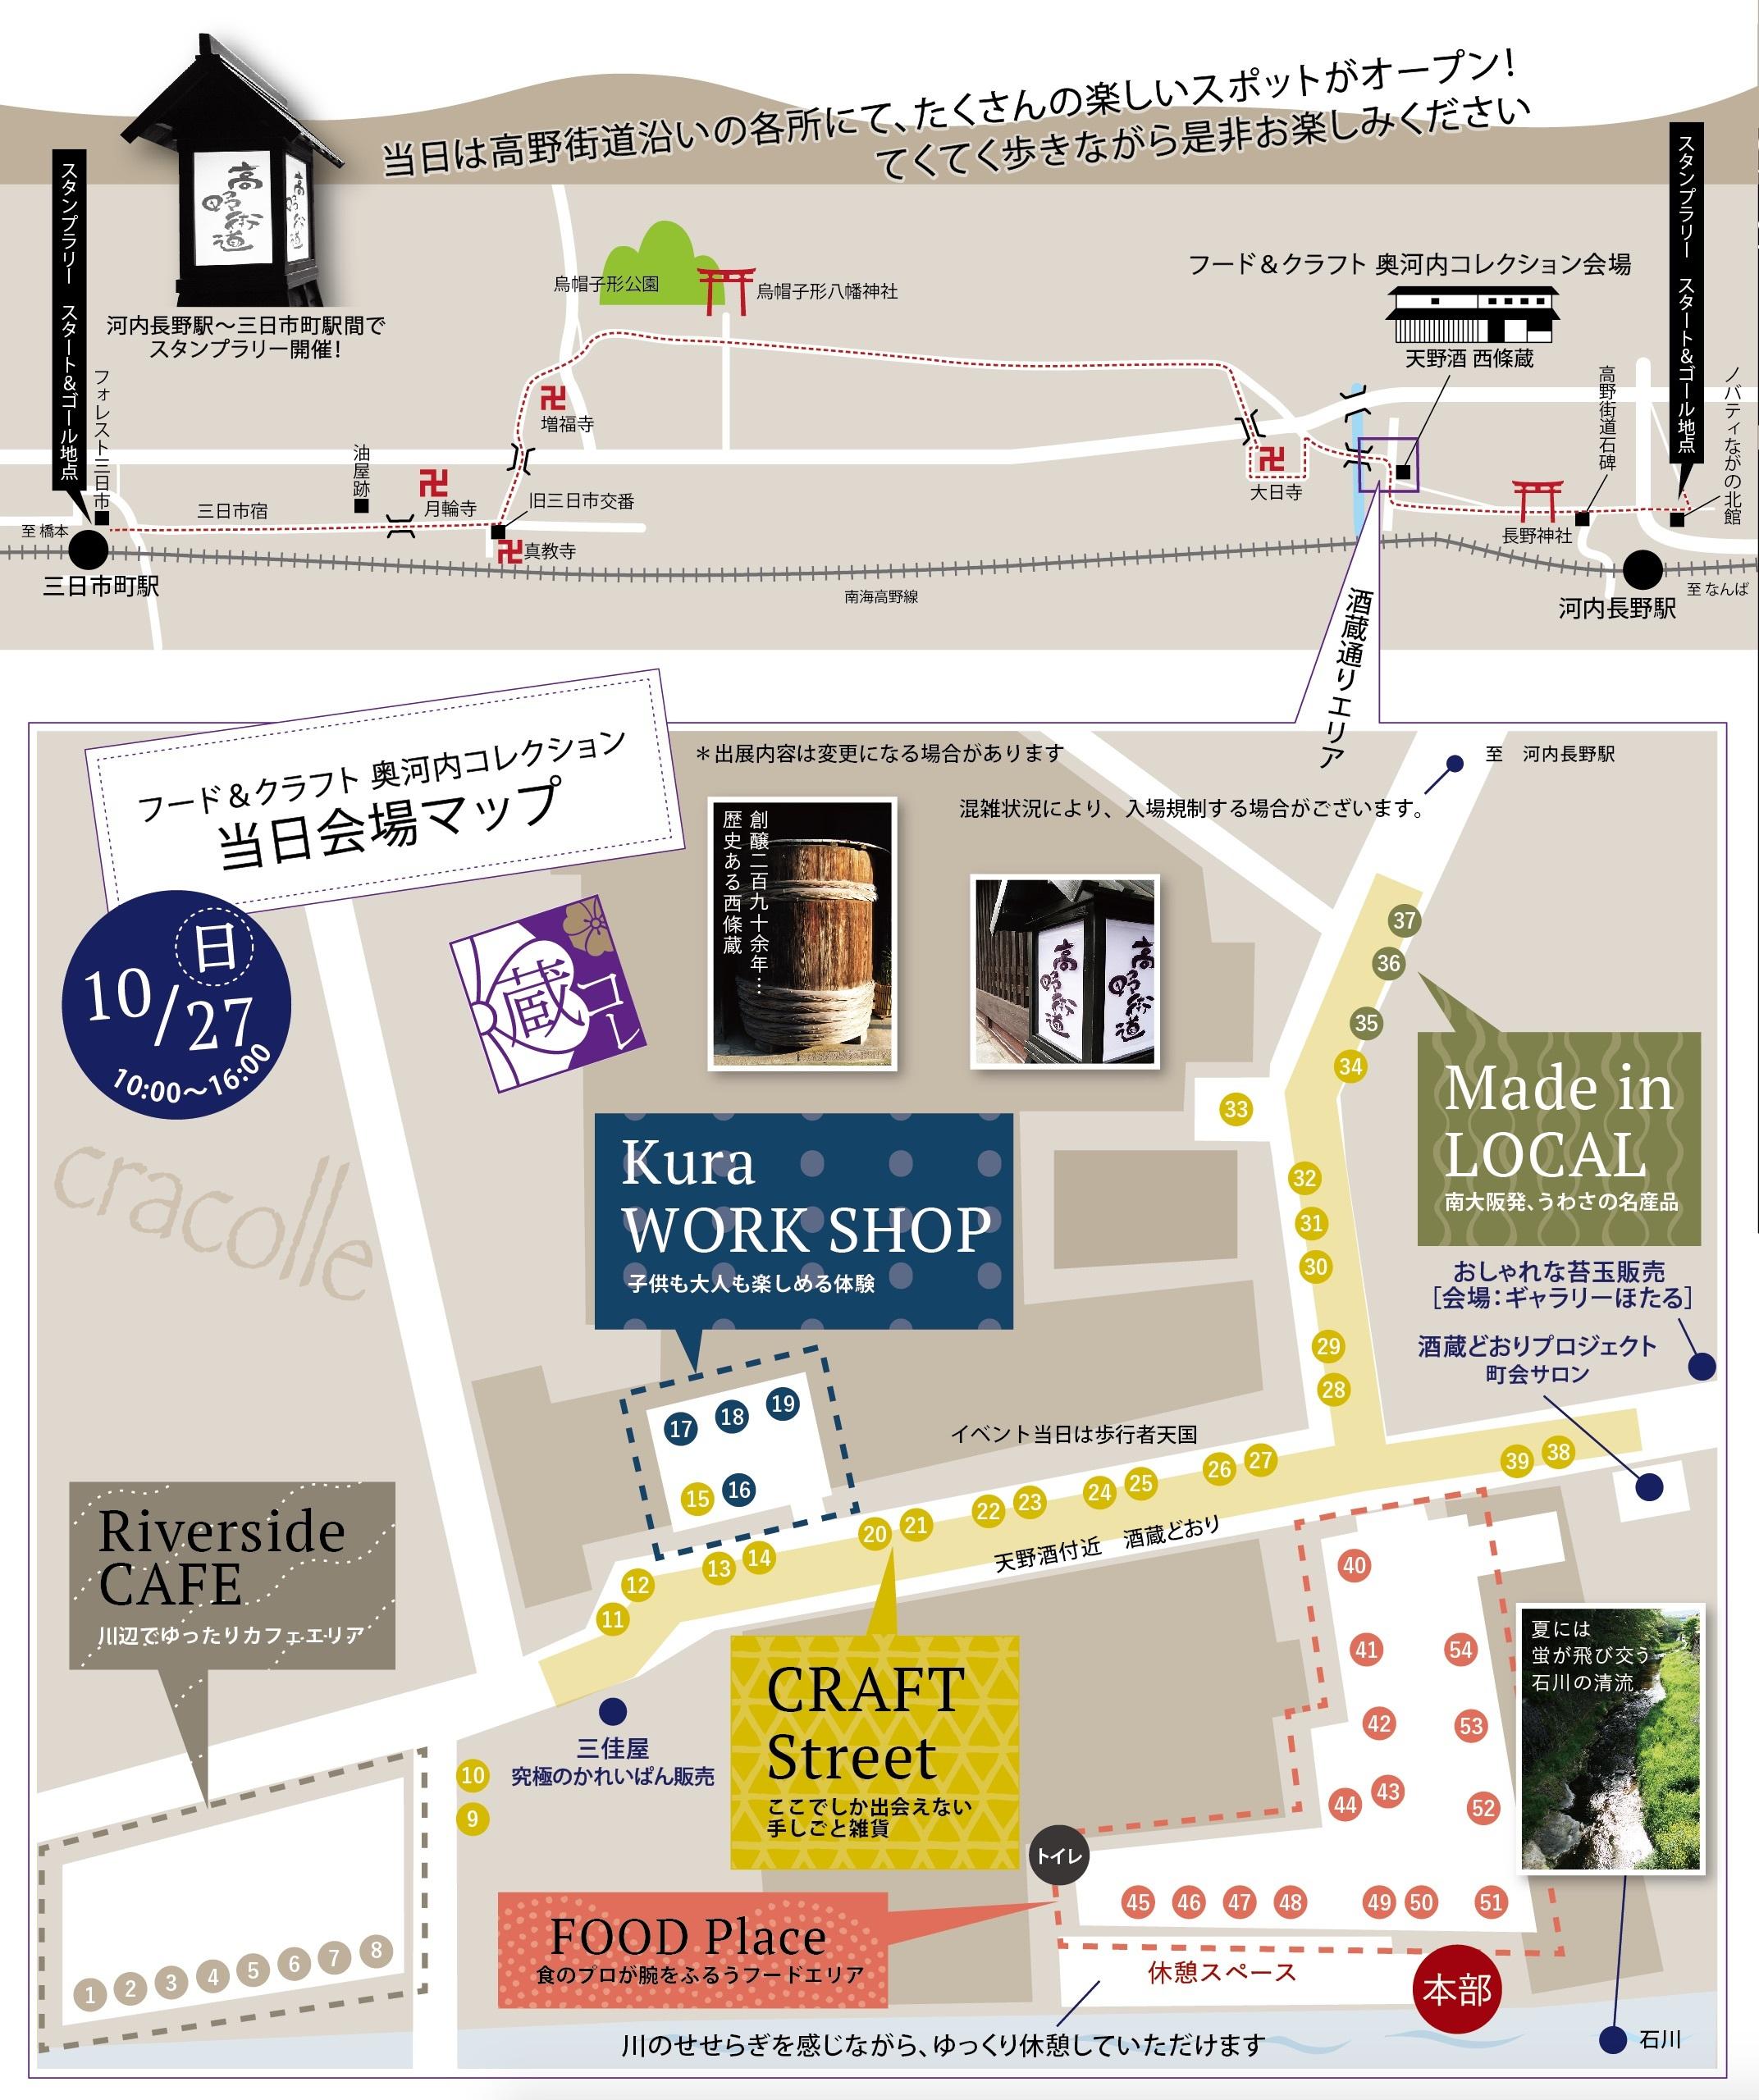 map_201910071733077fb.jpg